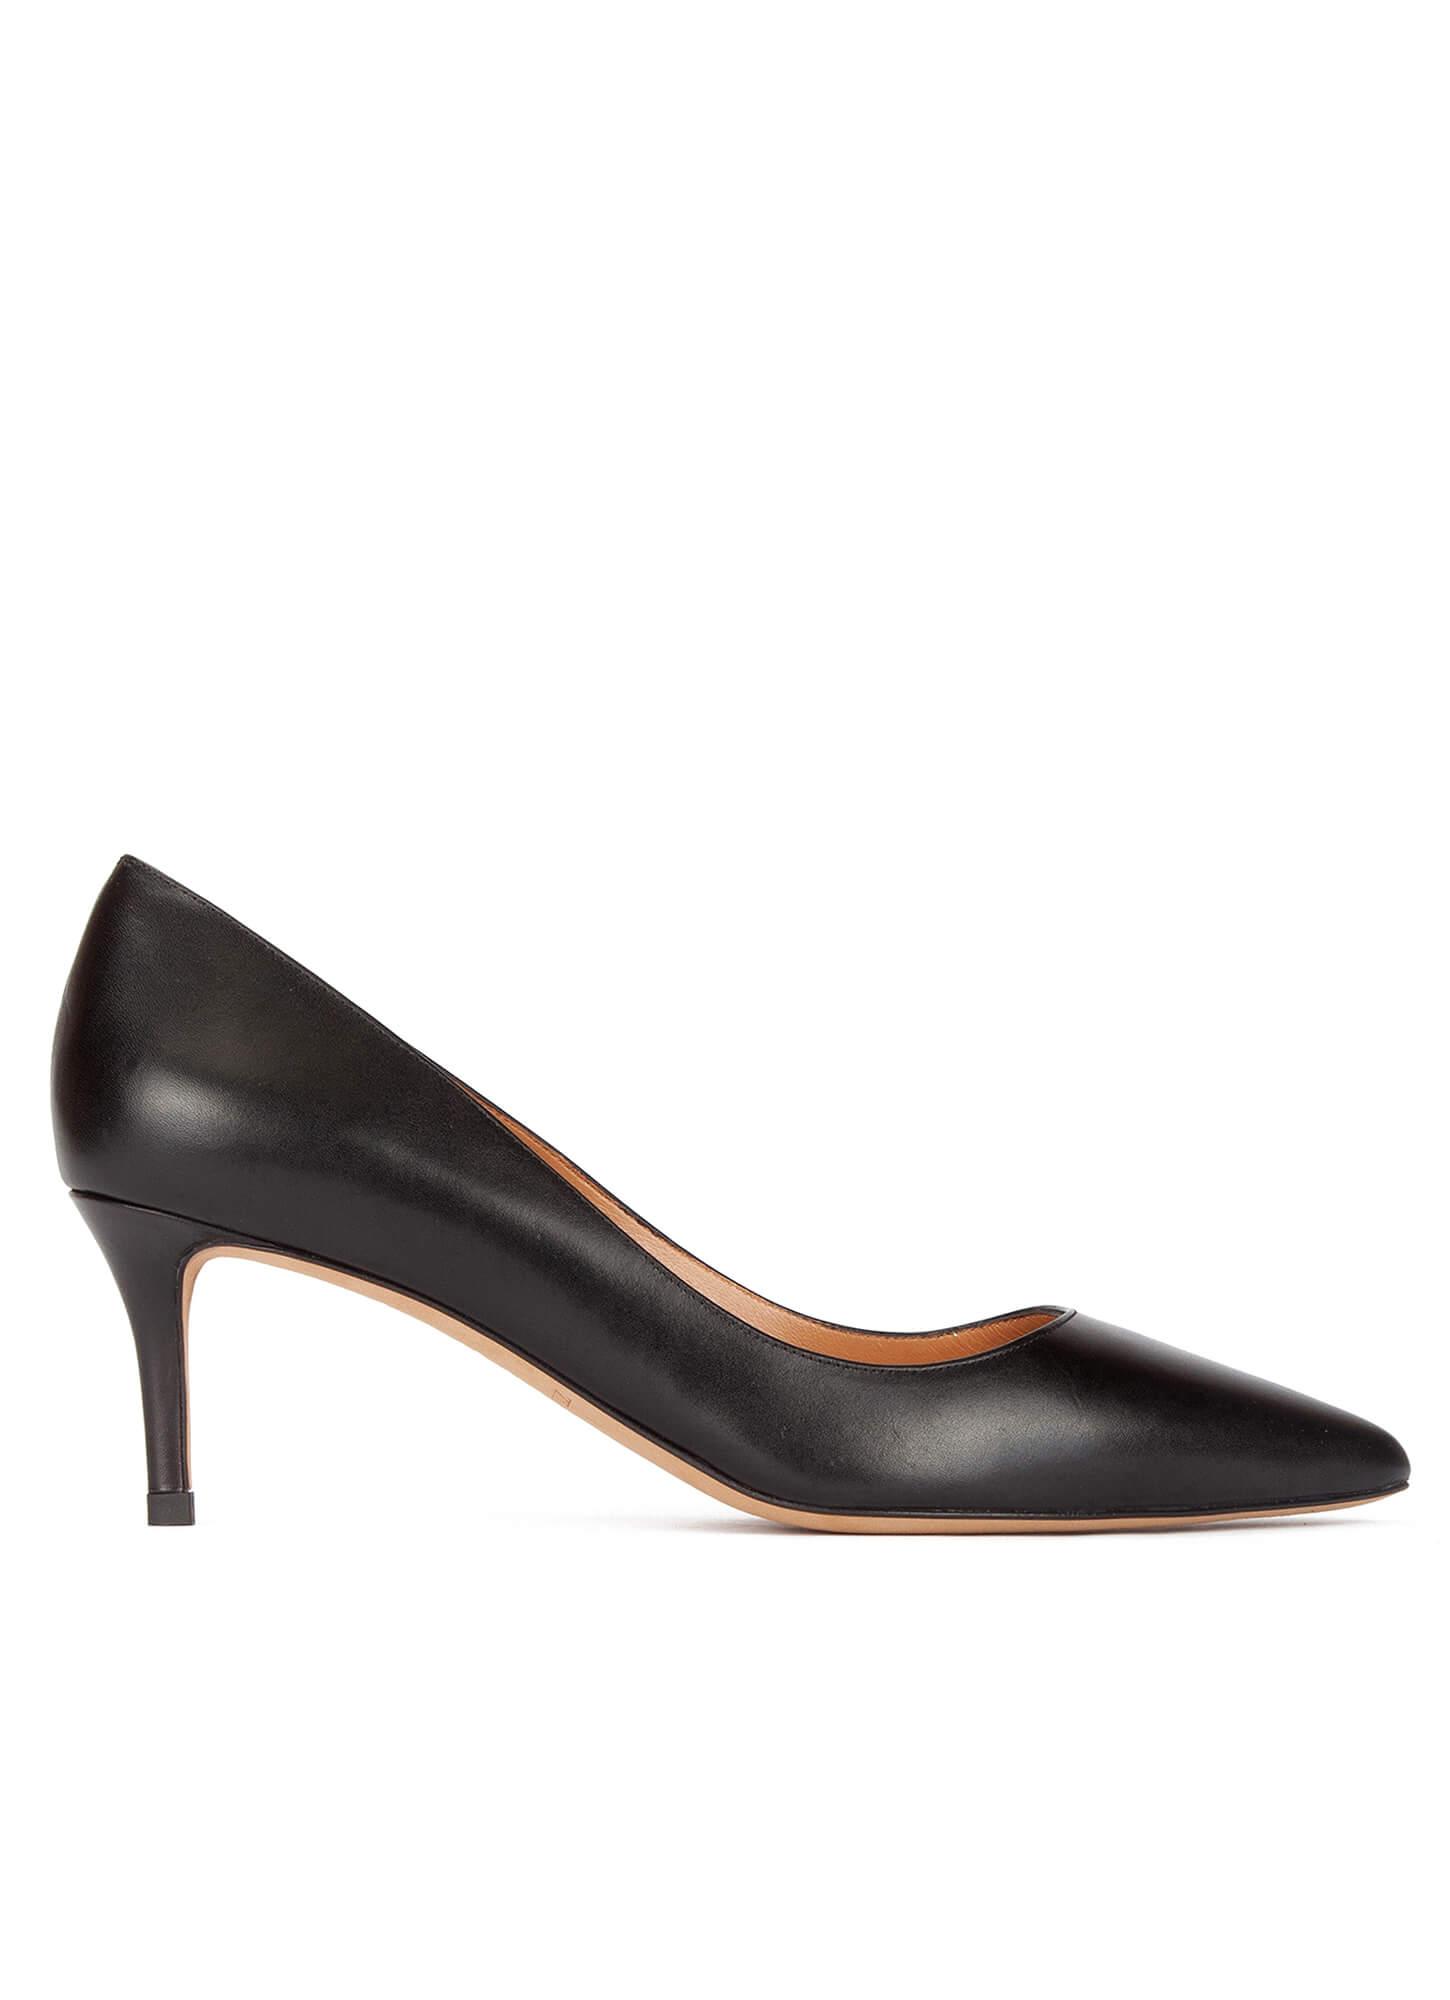 De Negro Zapato Salon Medio Tacon OkuiPXZ